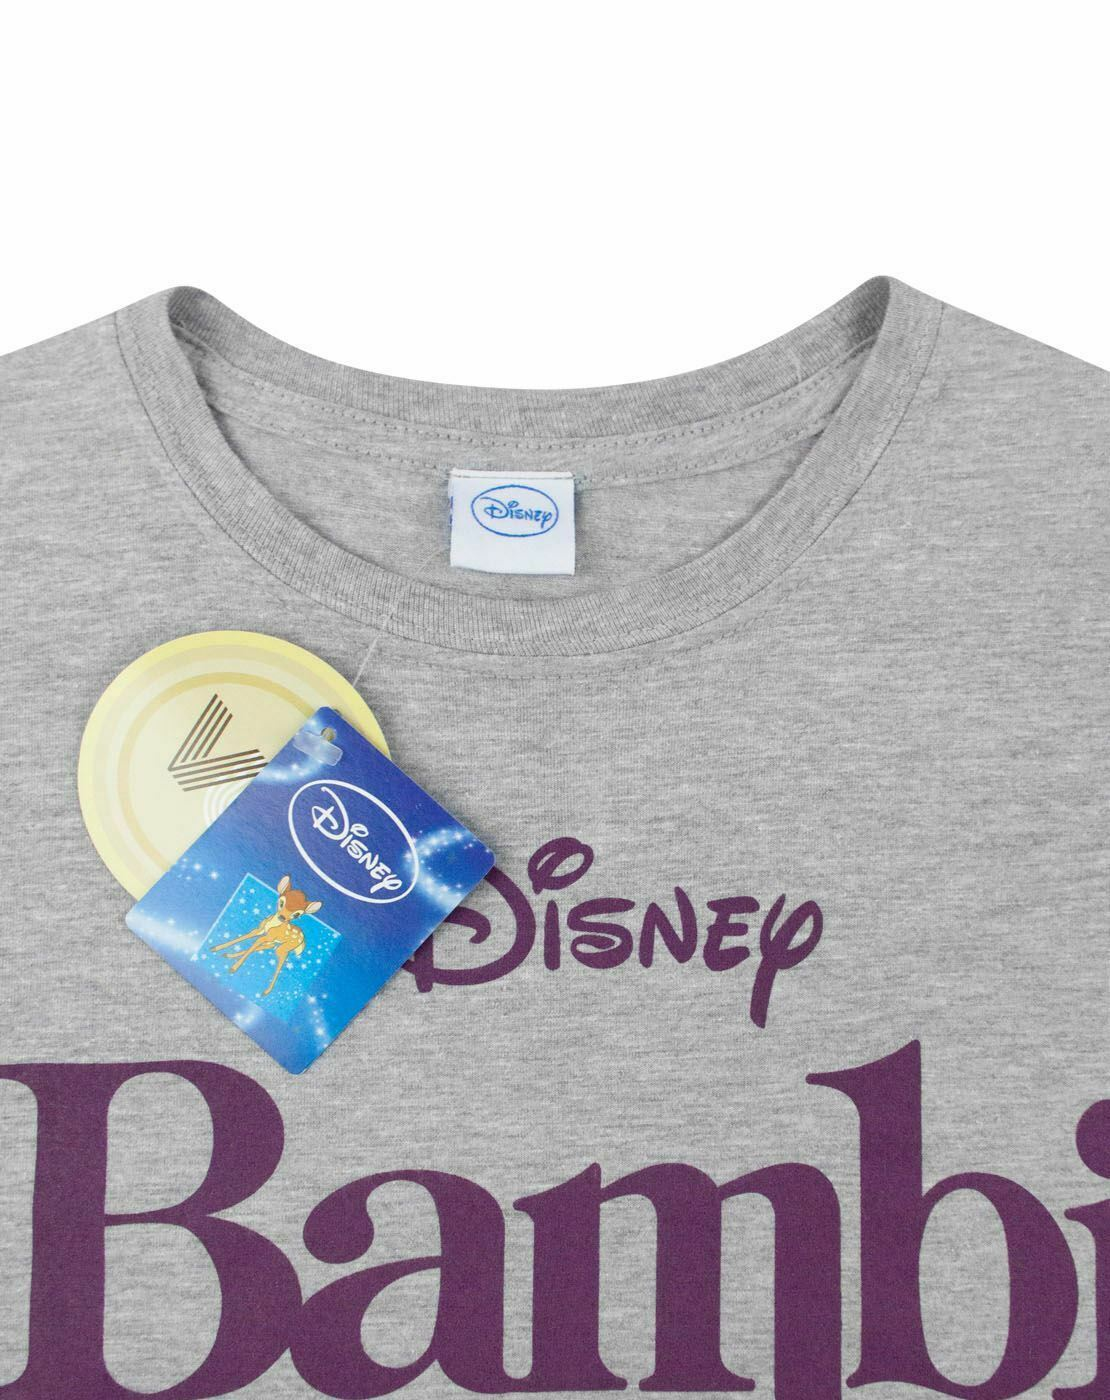 Disney-Bambi-Motif-Women-039-s-T-Shirt thumbnail 9